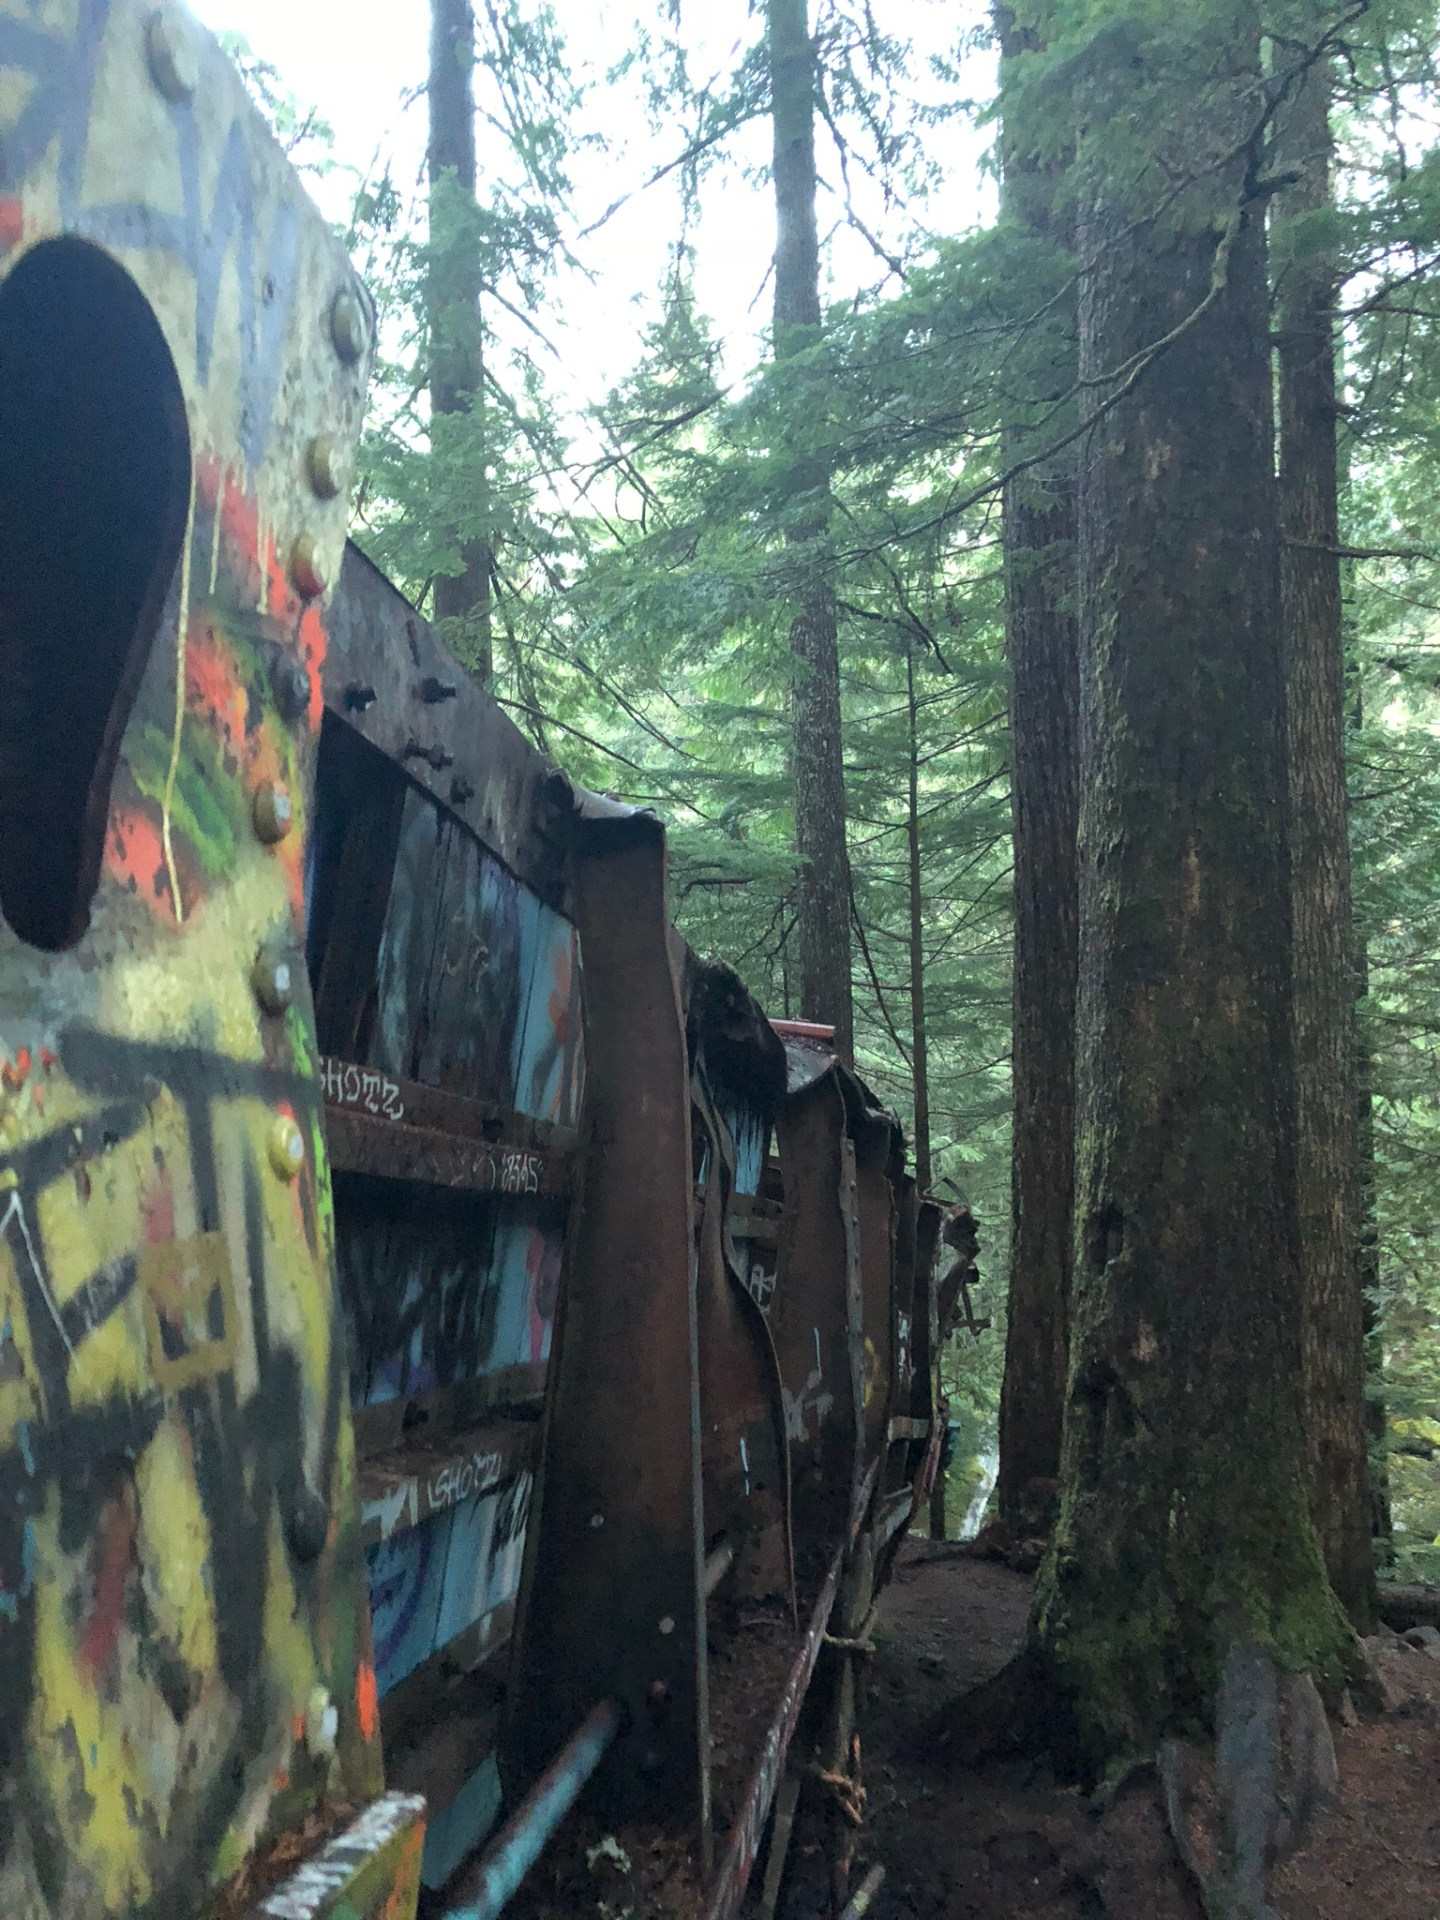 Train carriage, Whistler